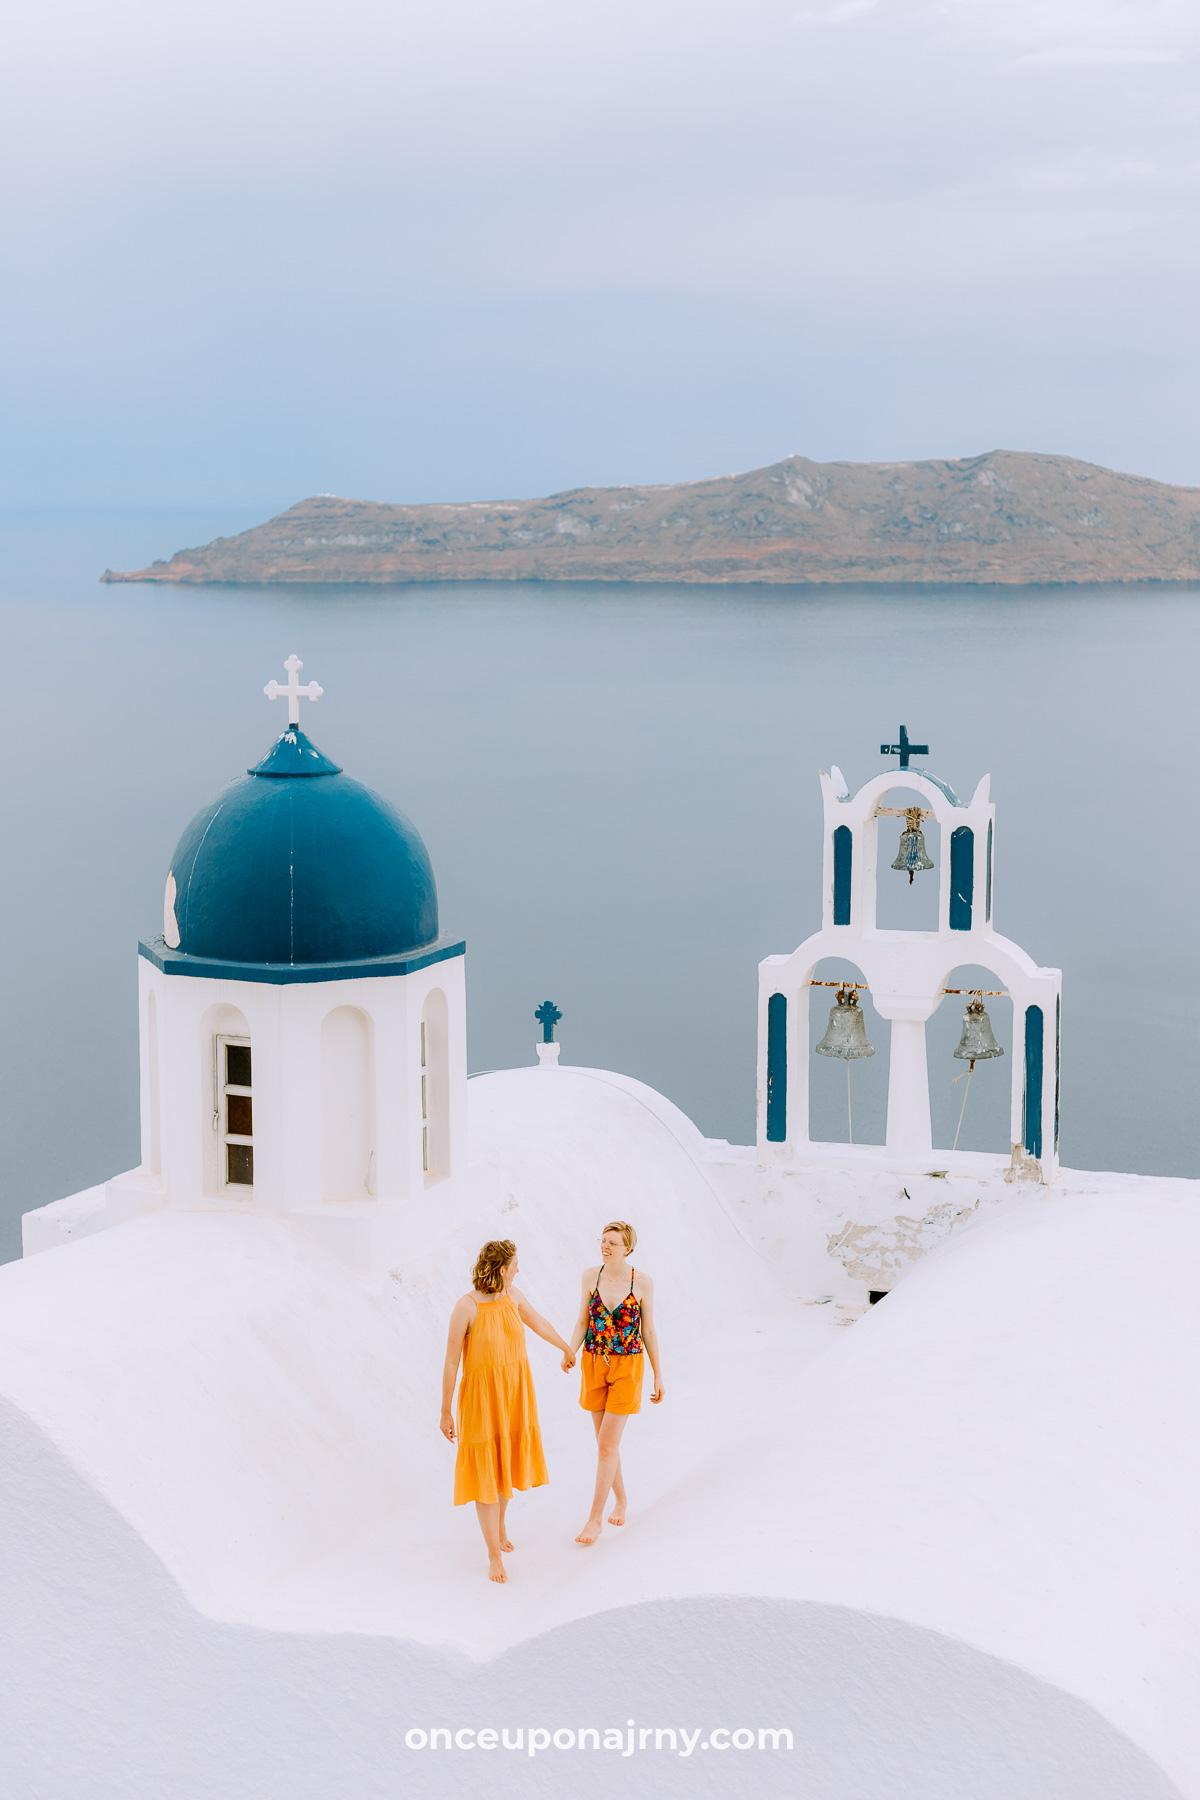 Theoskepasti Church Skaros Rock, Imerovigli photo spots